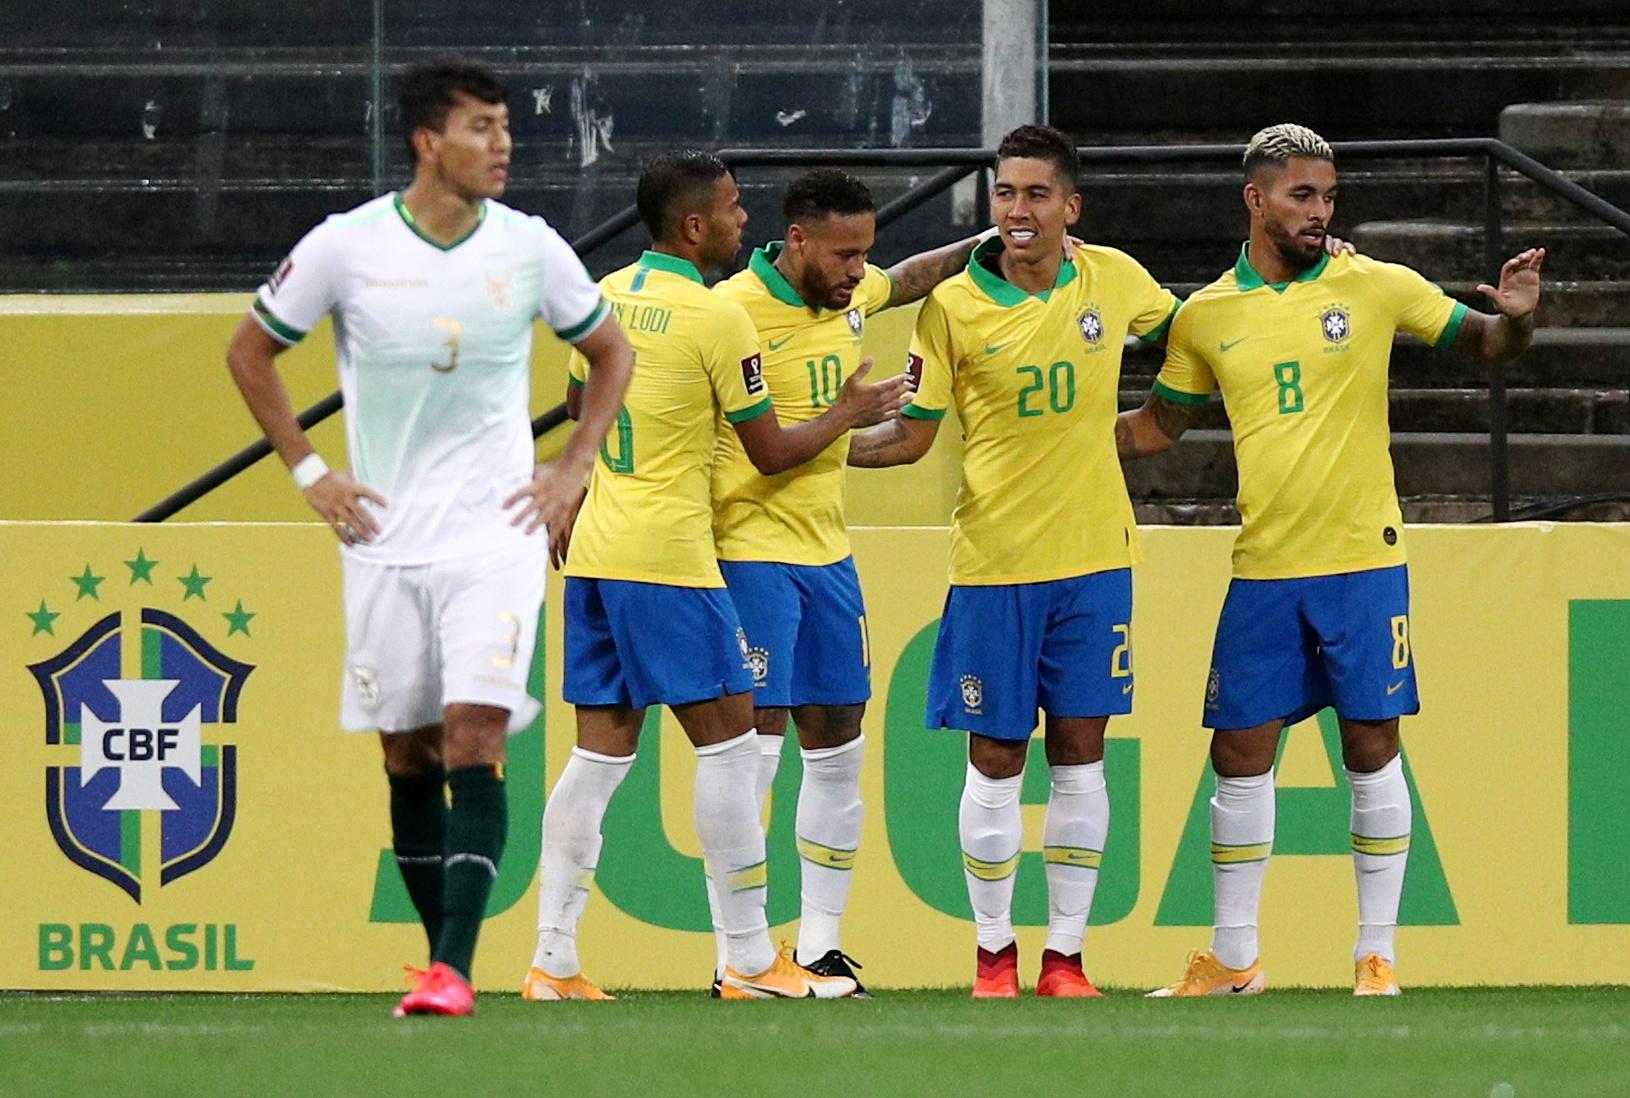 Brasil Bolivia Eliminatorias Sudamericanas